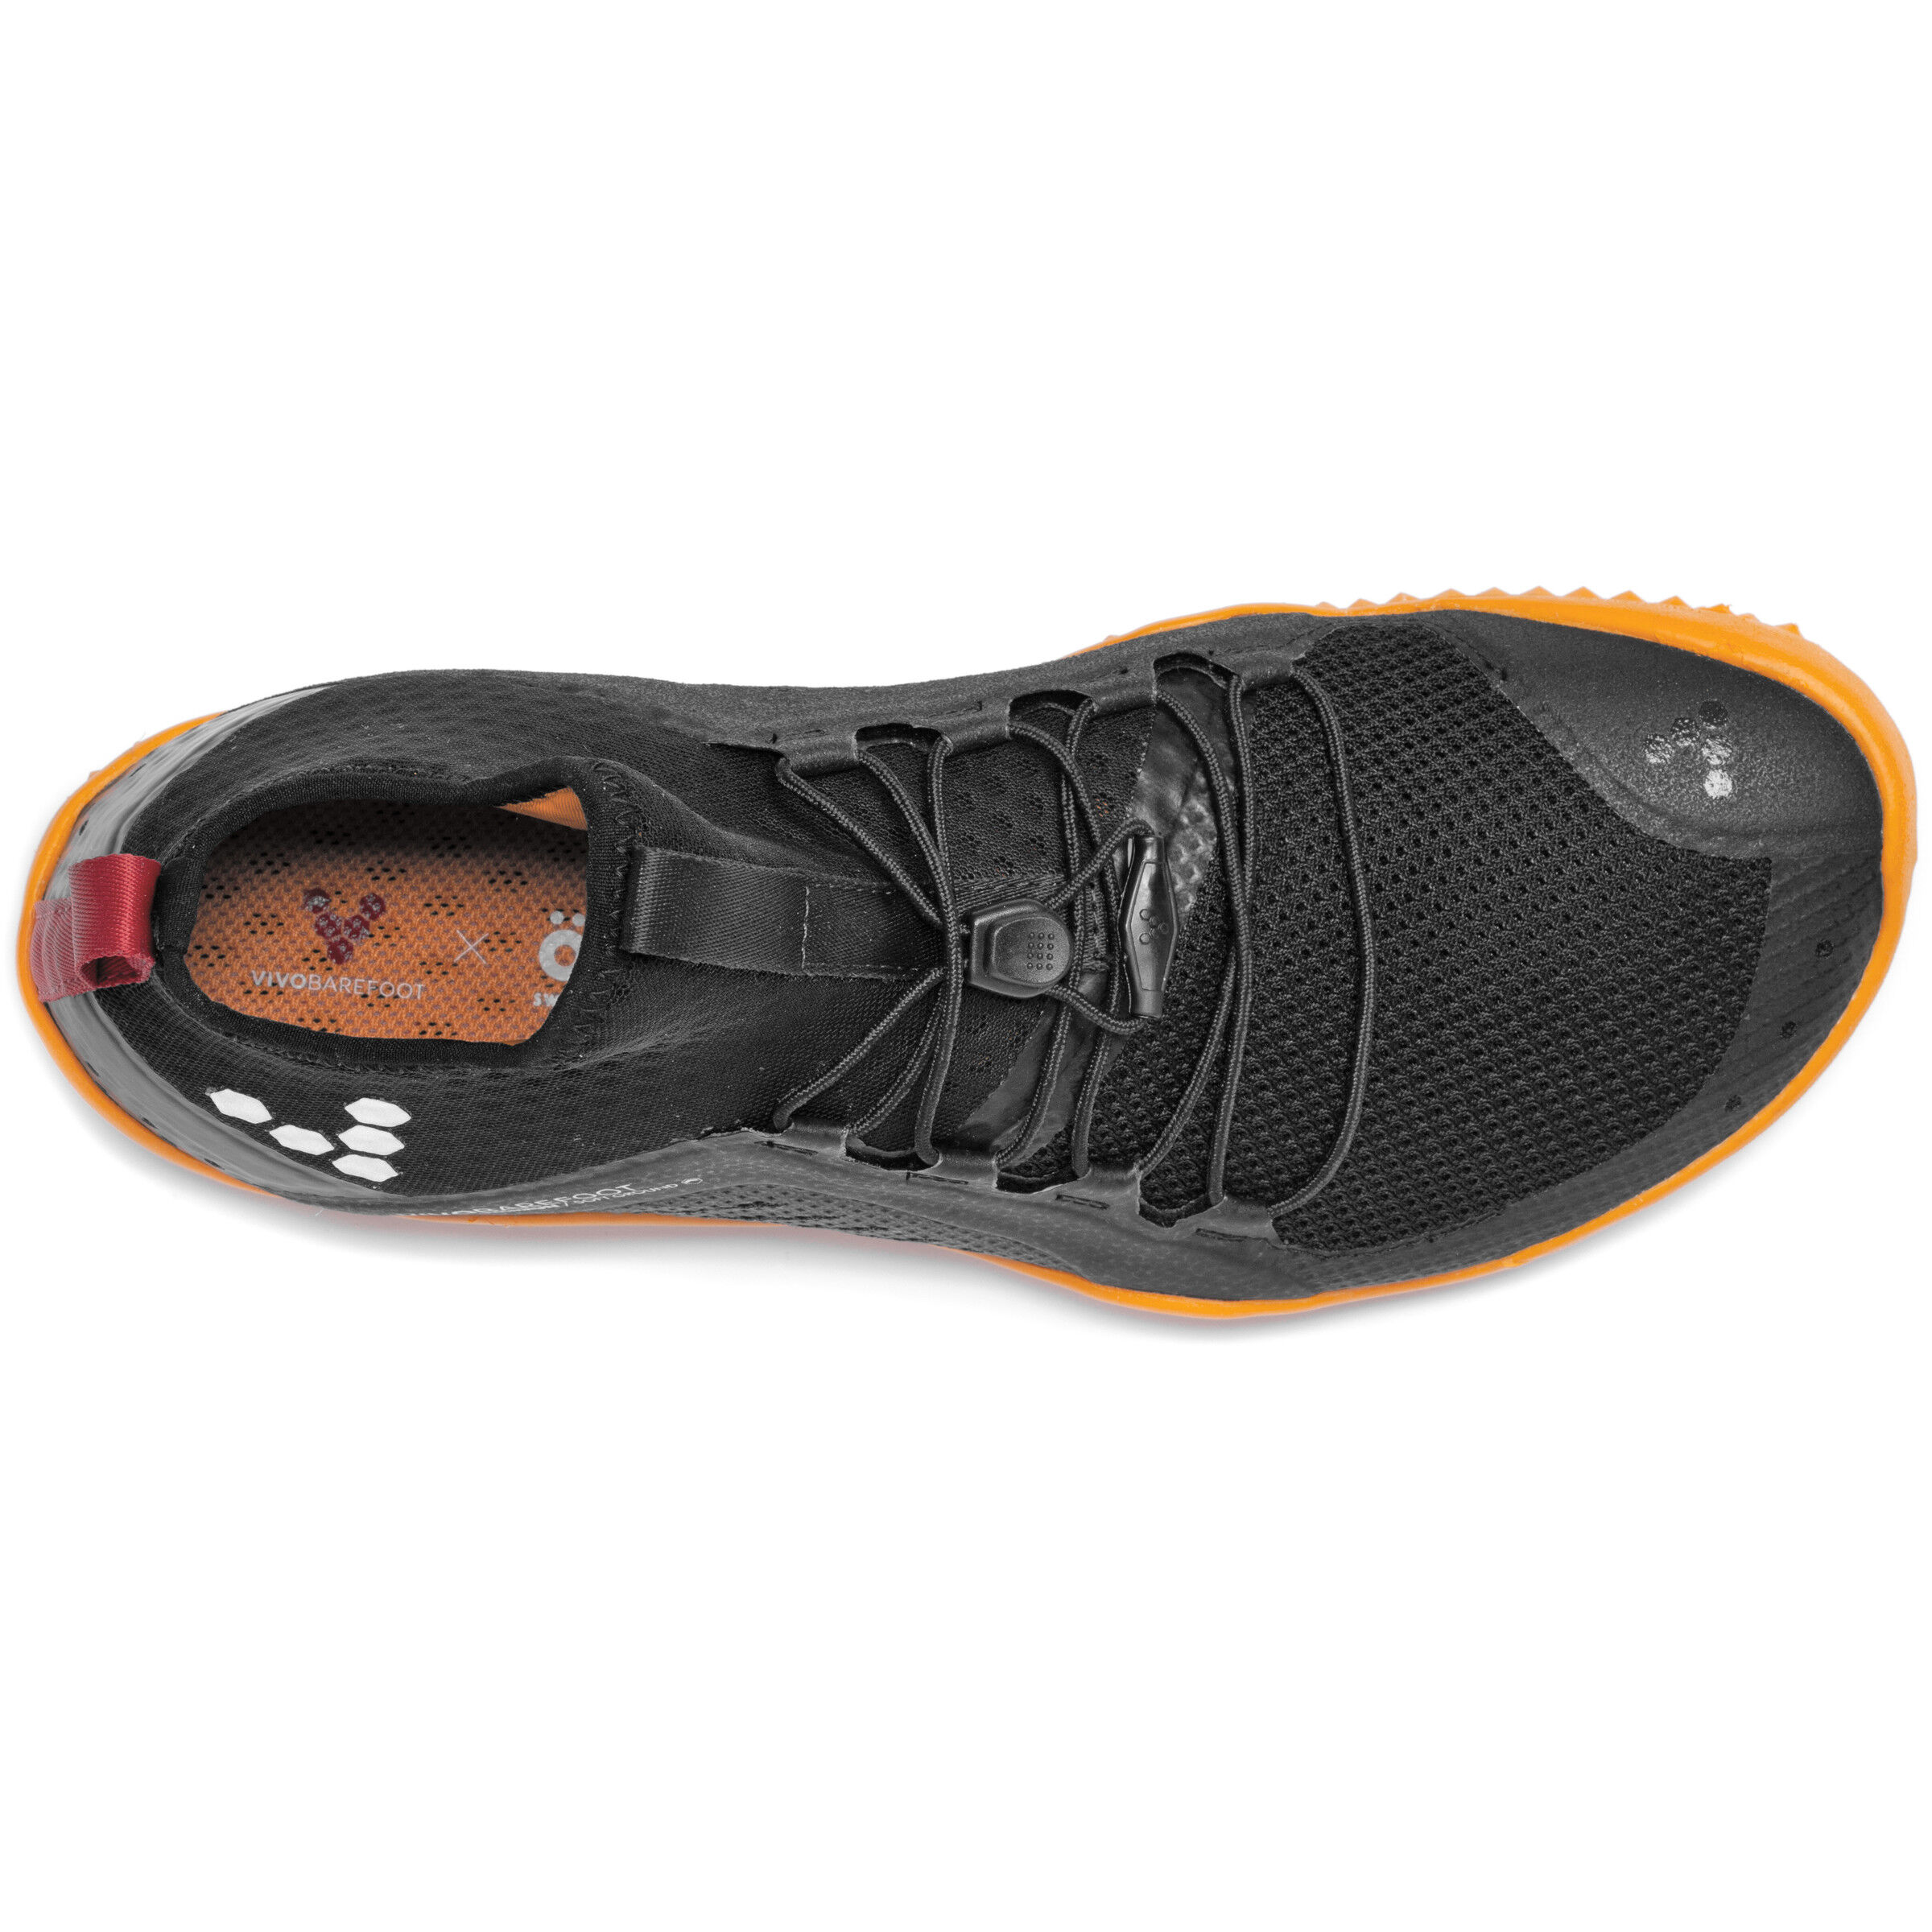 Primus Swimrun Vivobarefoot Mesh Sg Boots Damen R5A4jL